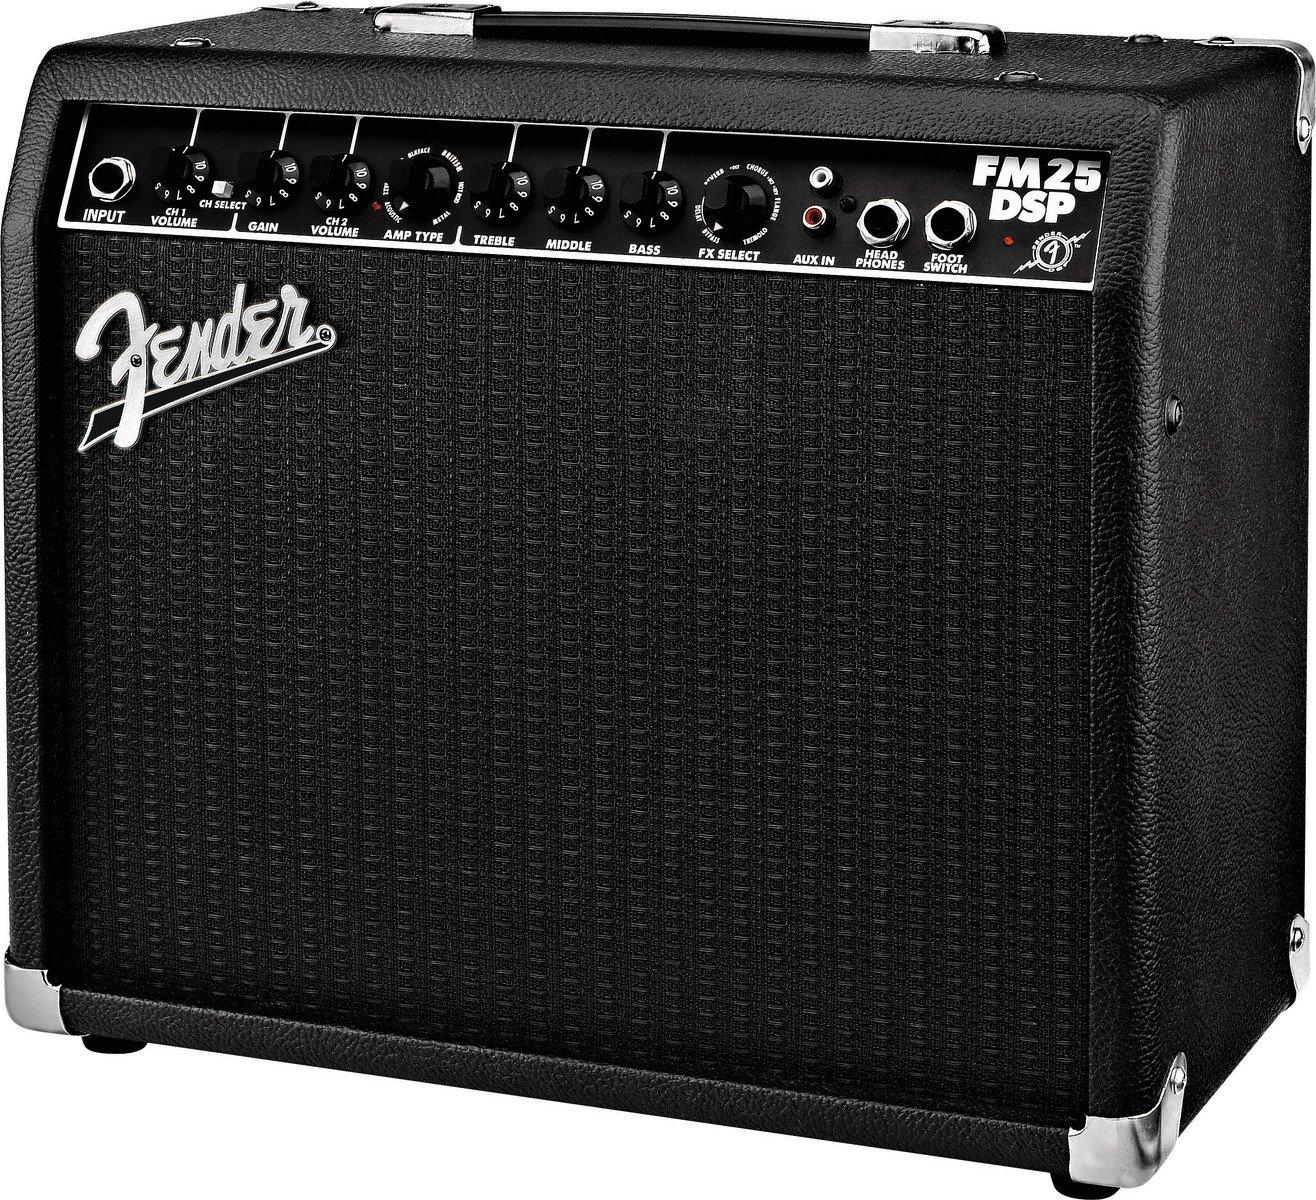 Fender Fm 25 Dsp Sweetwater 70w Amplifier Image 1